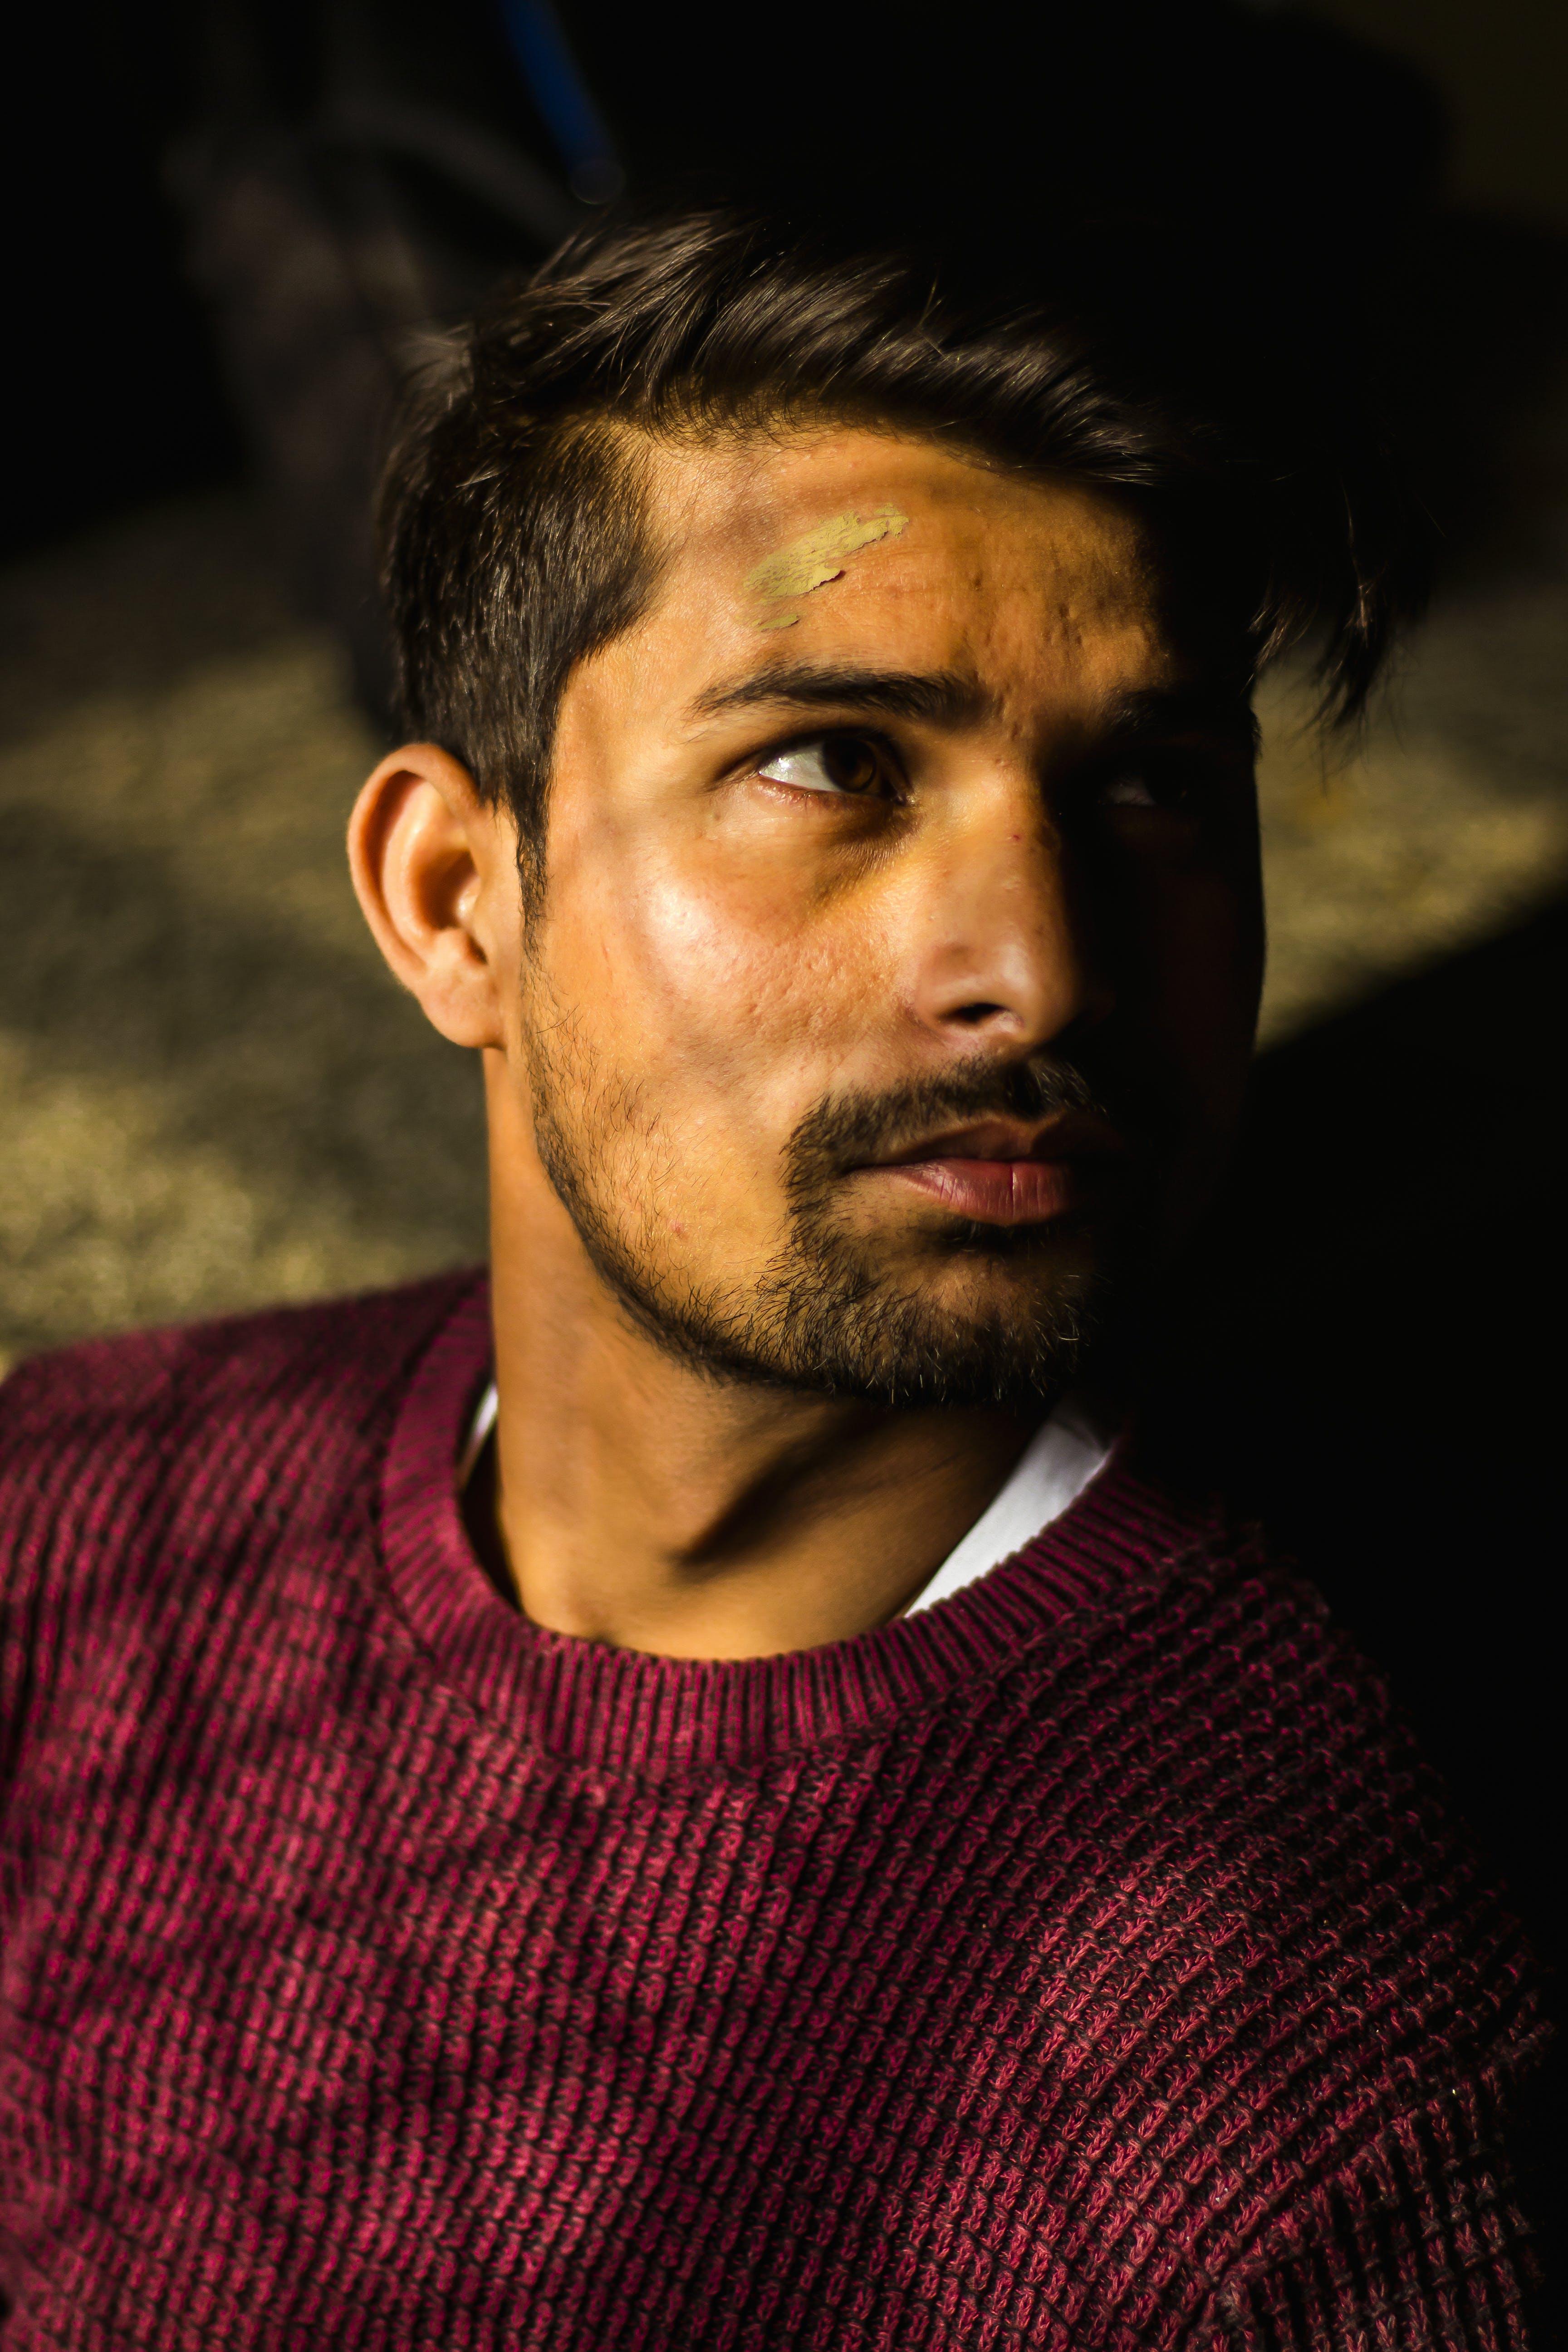 Photo of Man Wearing Maroon Sweater